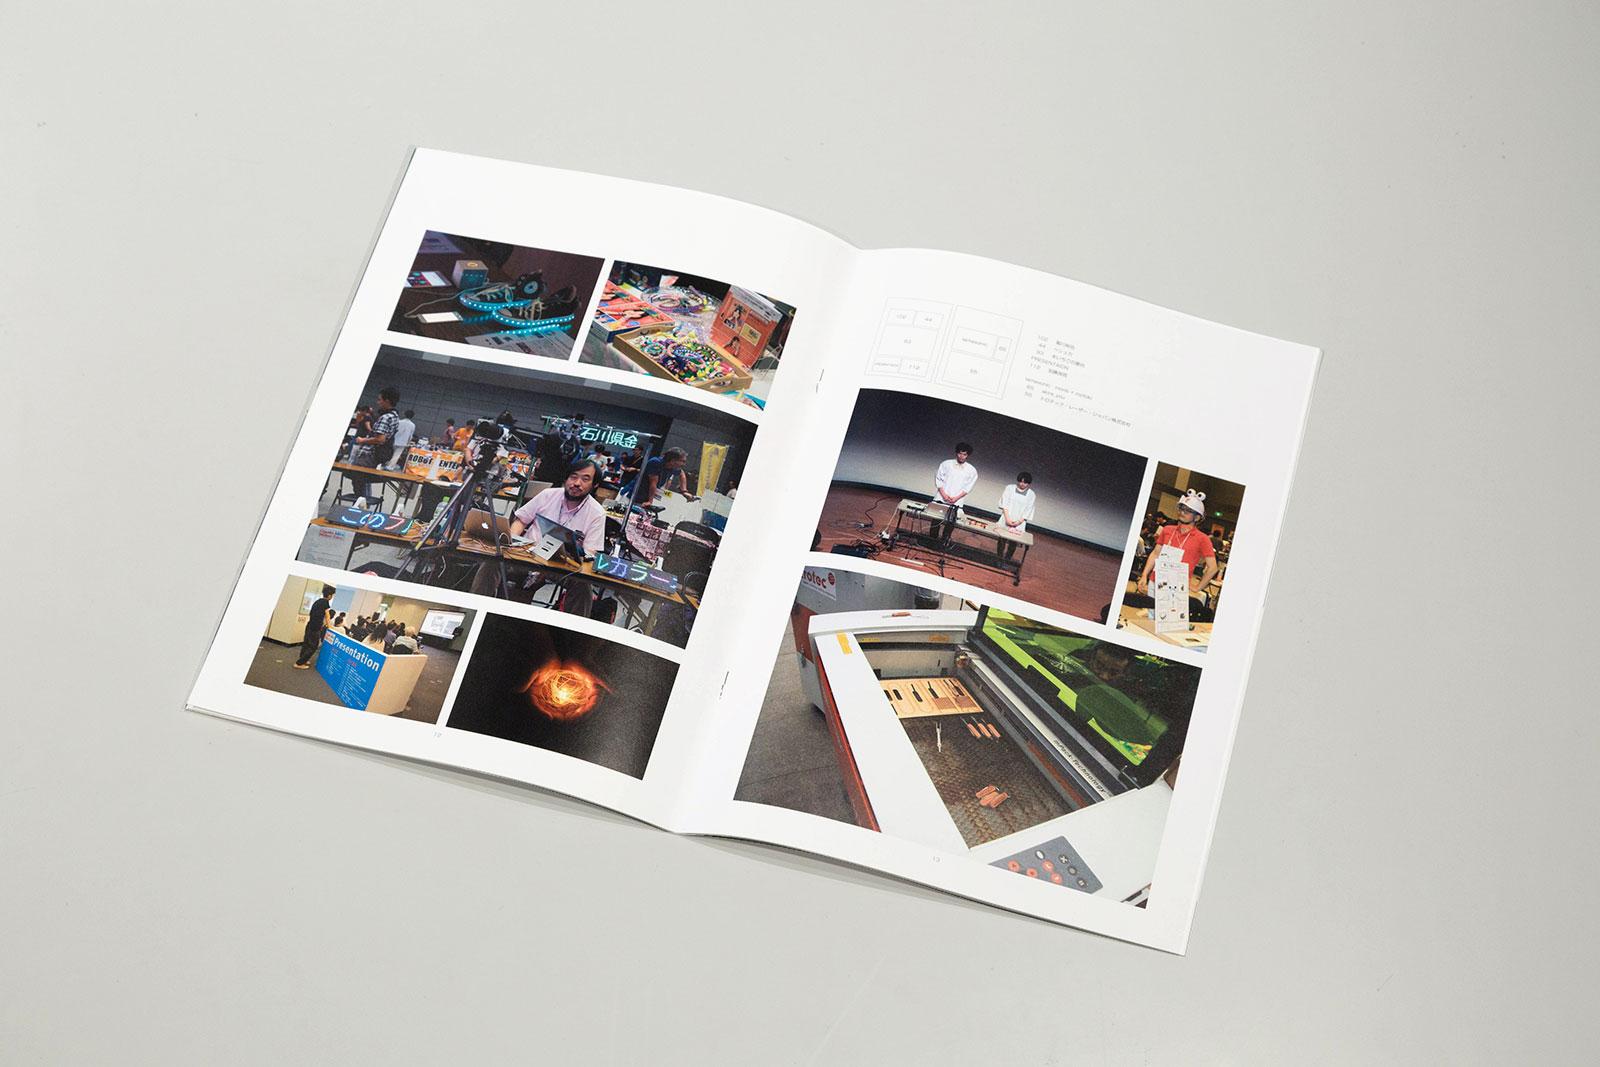 Ogaki Mini Maker Faire 2014イメージ